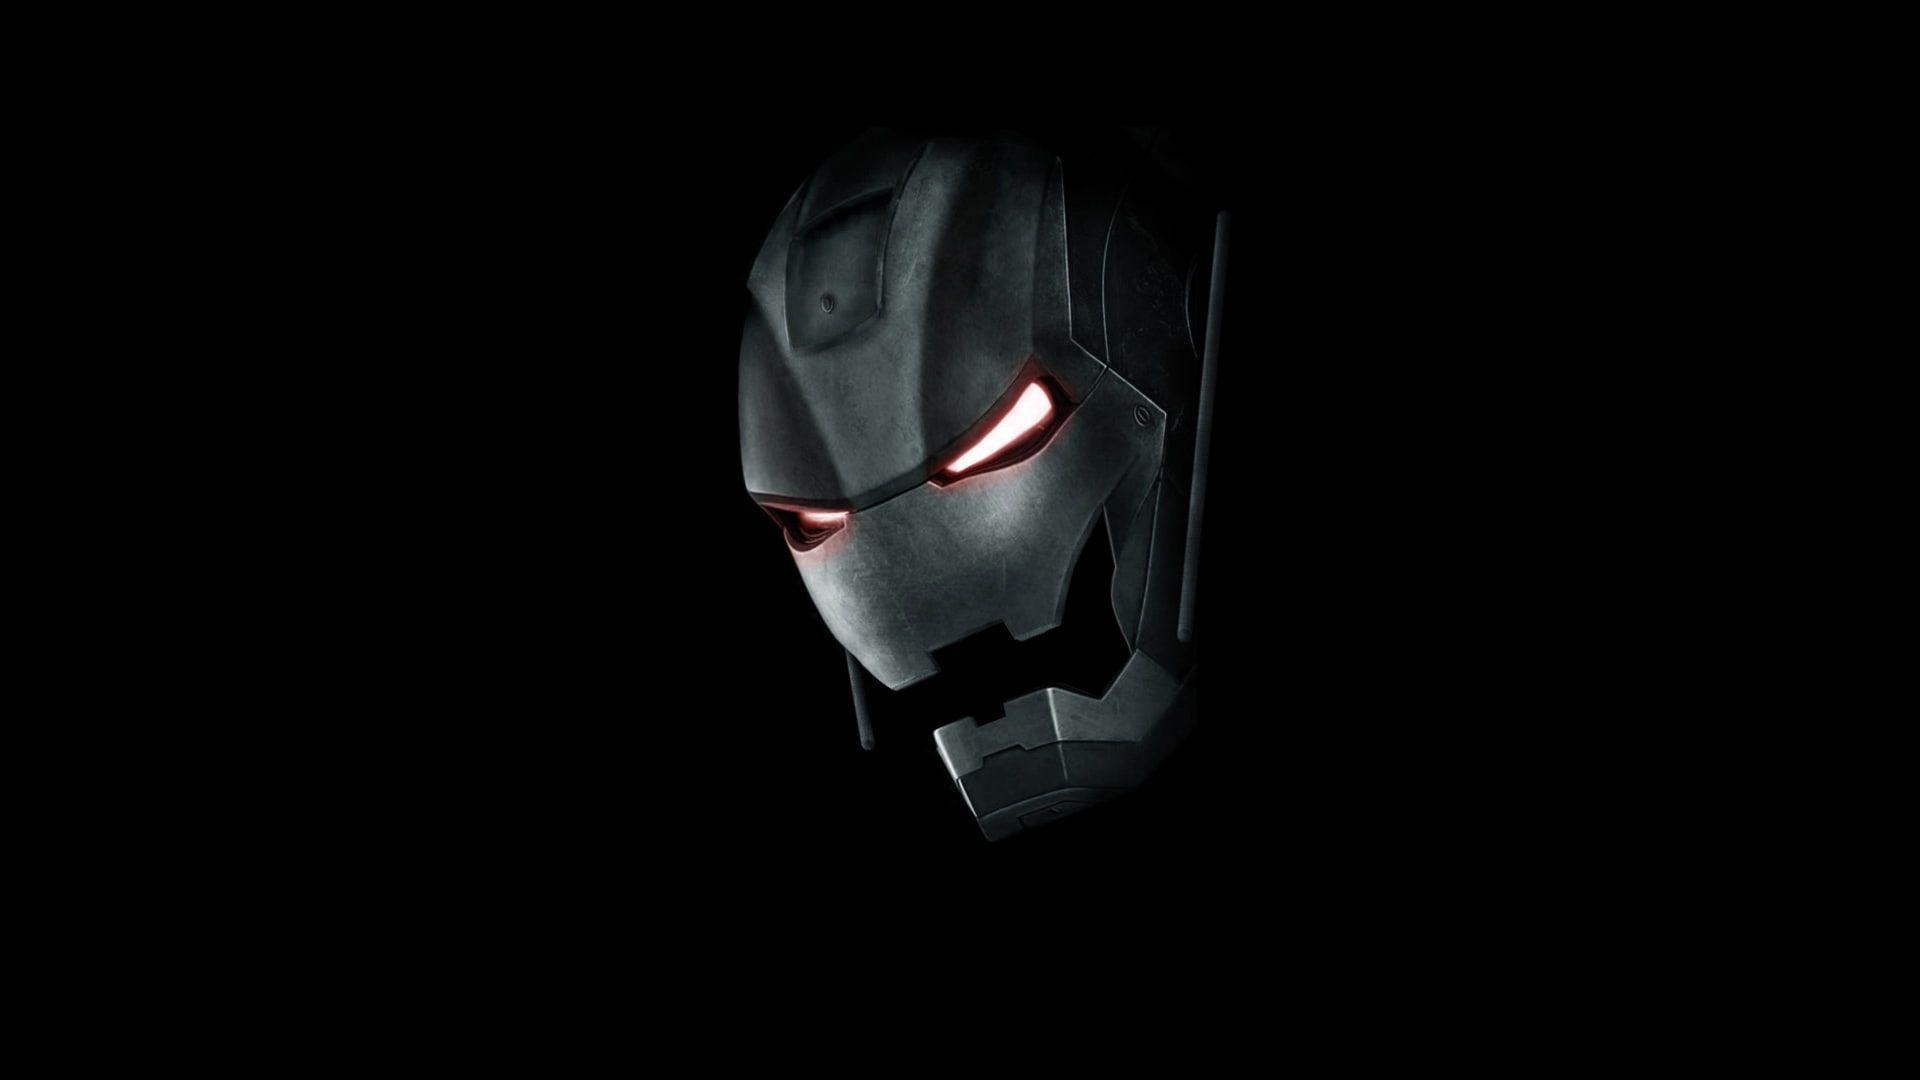 Avengers Age Of Ultron Face Ultron Black Hd Cartoon Comic Black